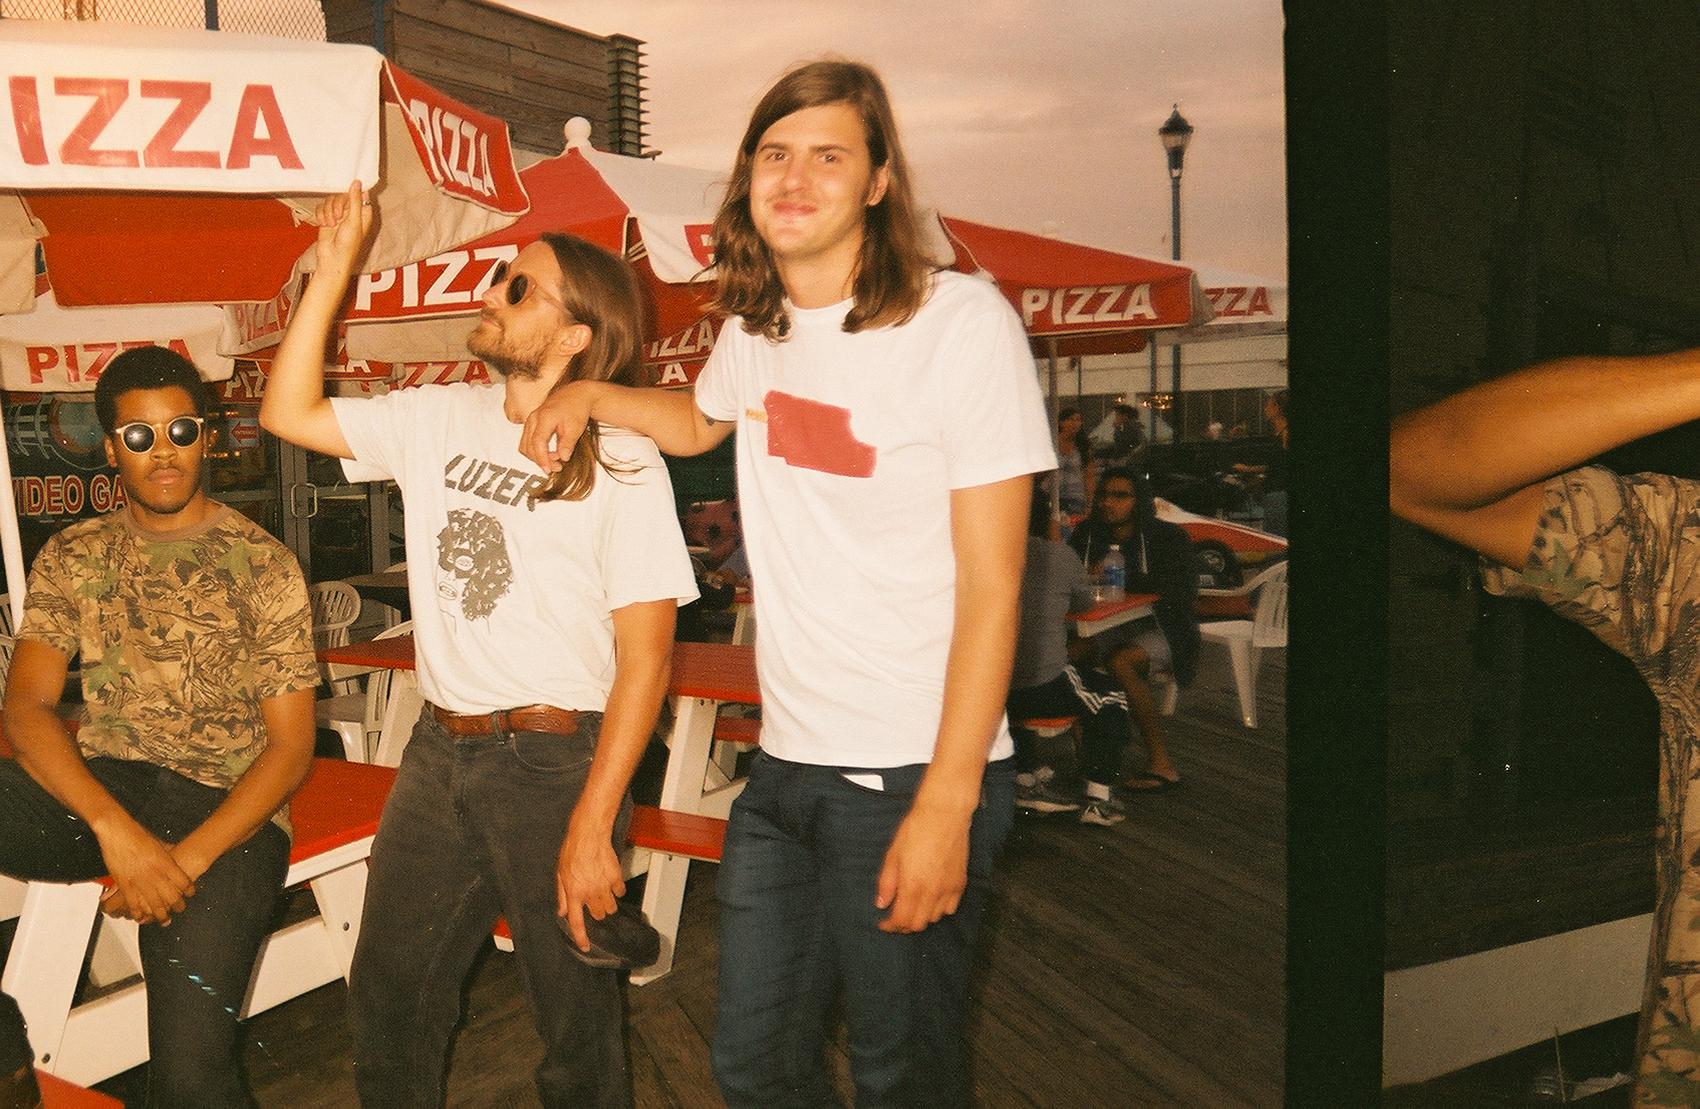 Nick, Grady, Sam outside a pizza place on Asbury Boardwalk